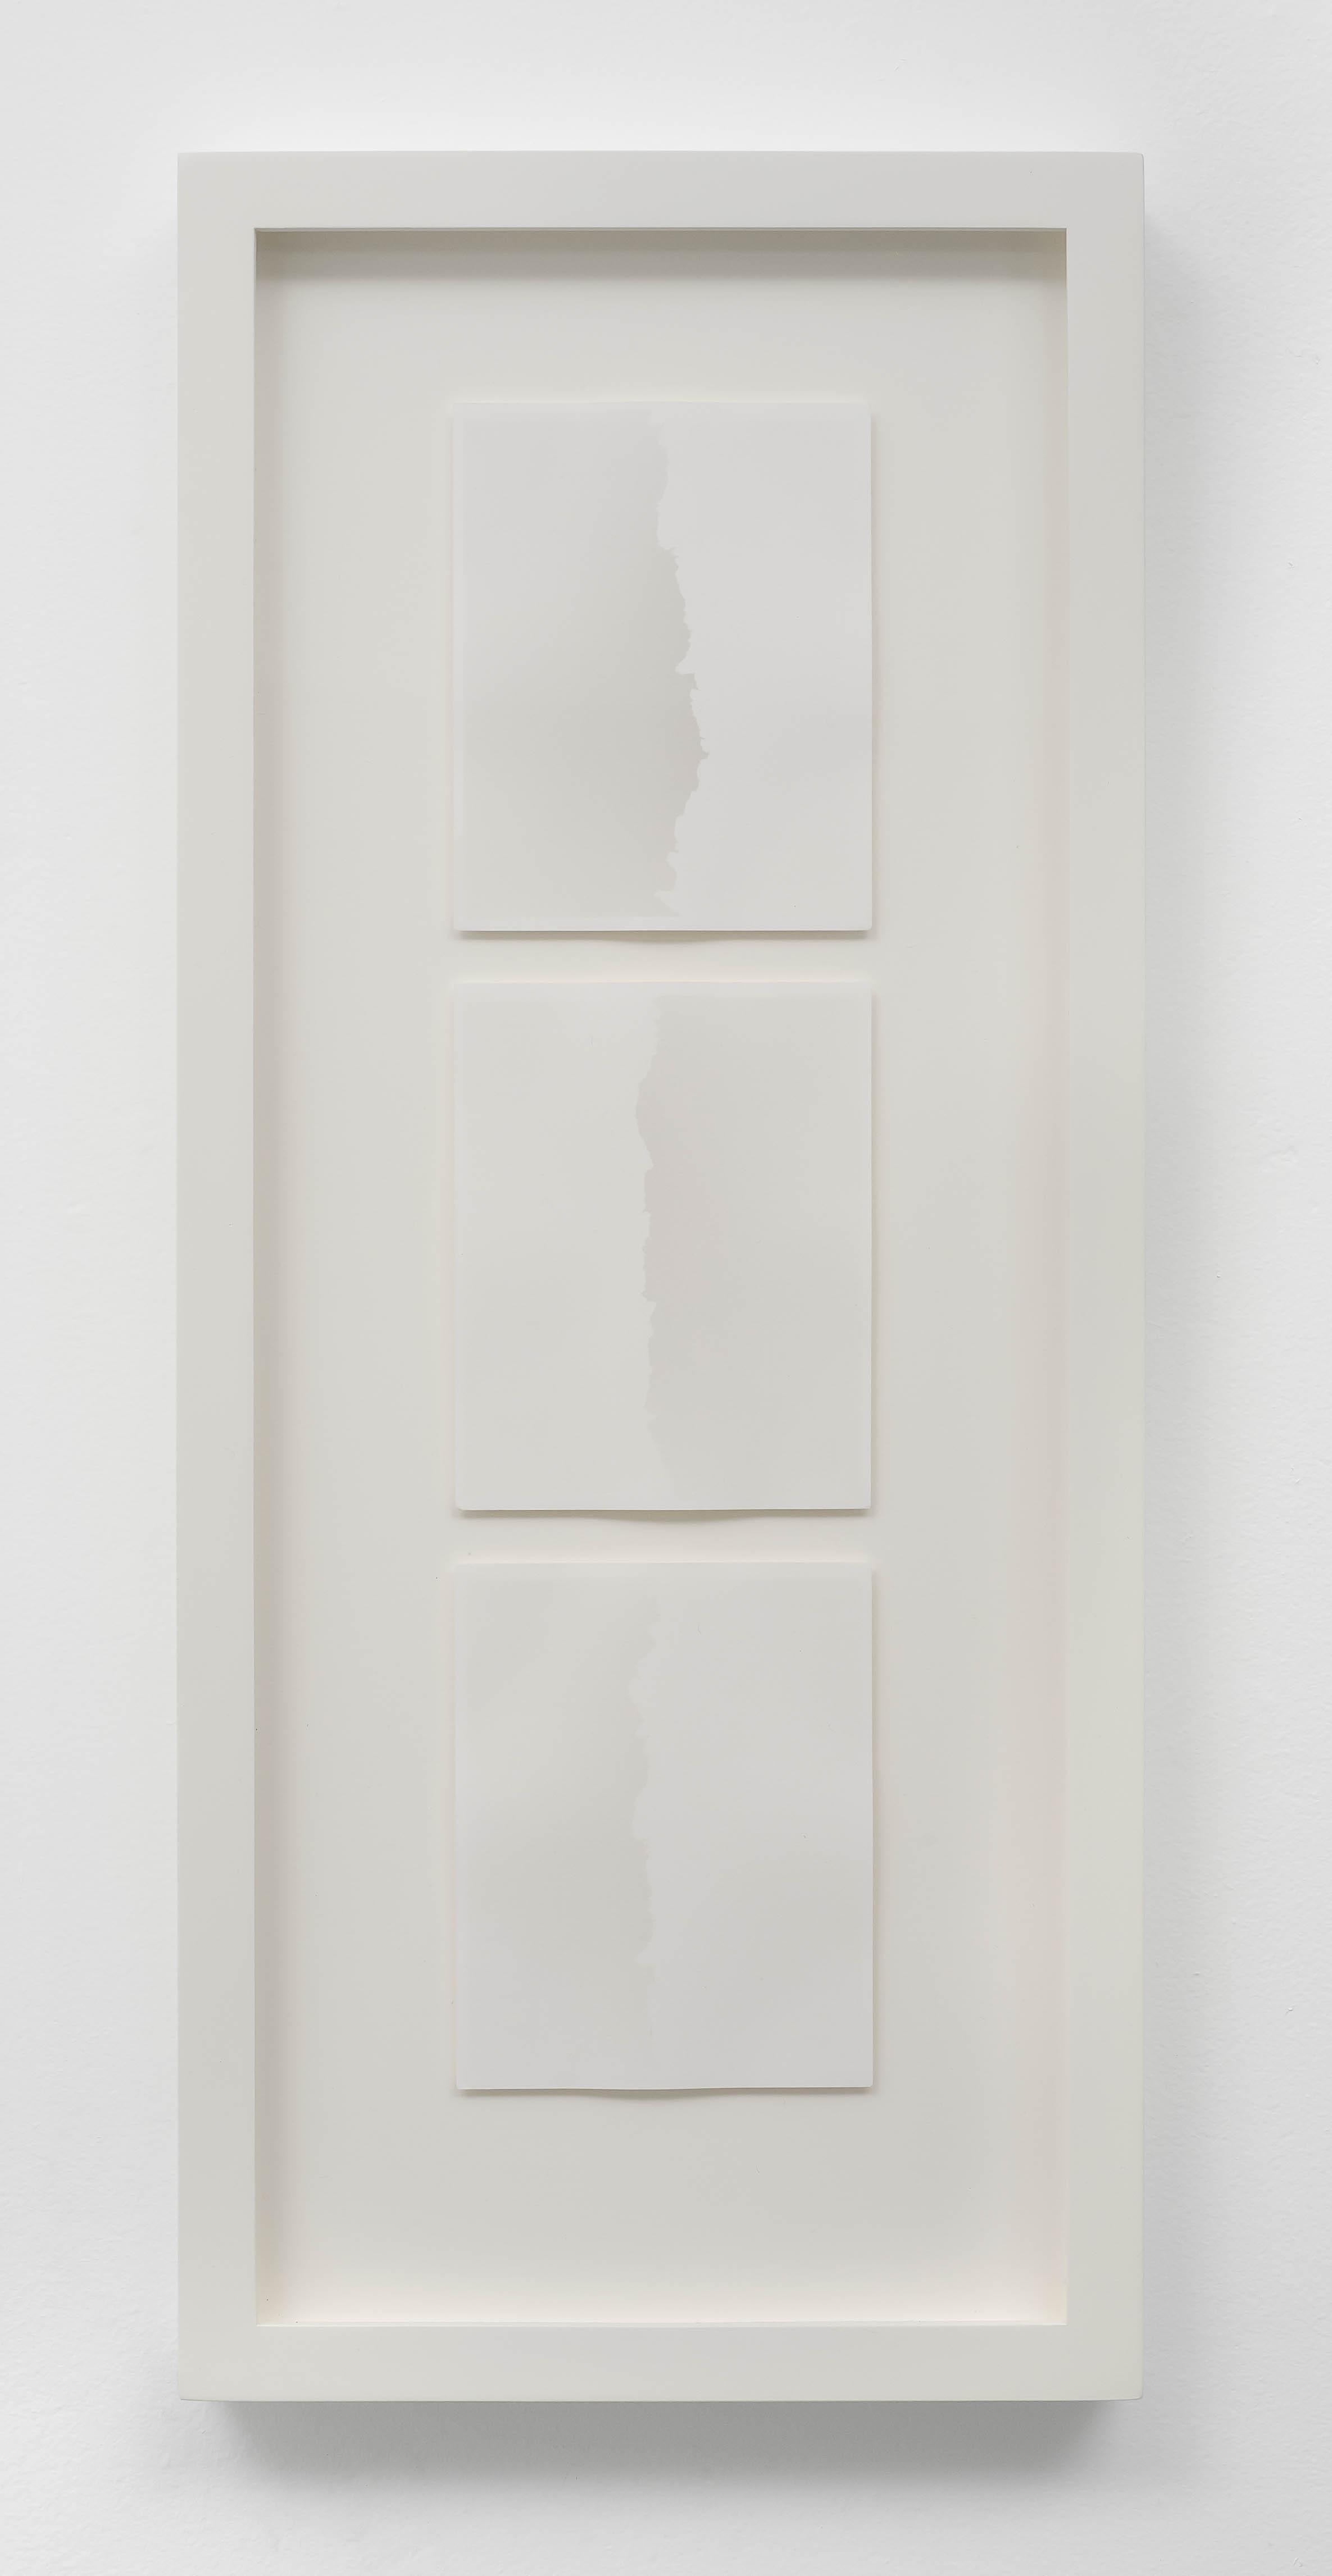 SCOTT B. DAVIS Lava, Pinacate, Mexico, 2018 Unique paper negative palladium/platinum prints, triptych 15 x 4 inches; frame: 21 x 9 inches